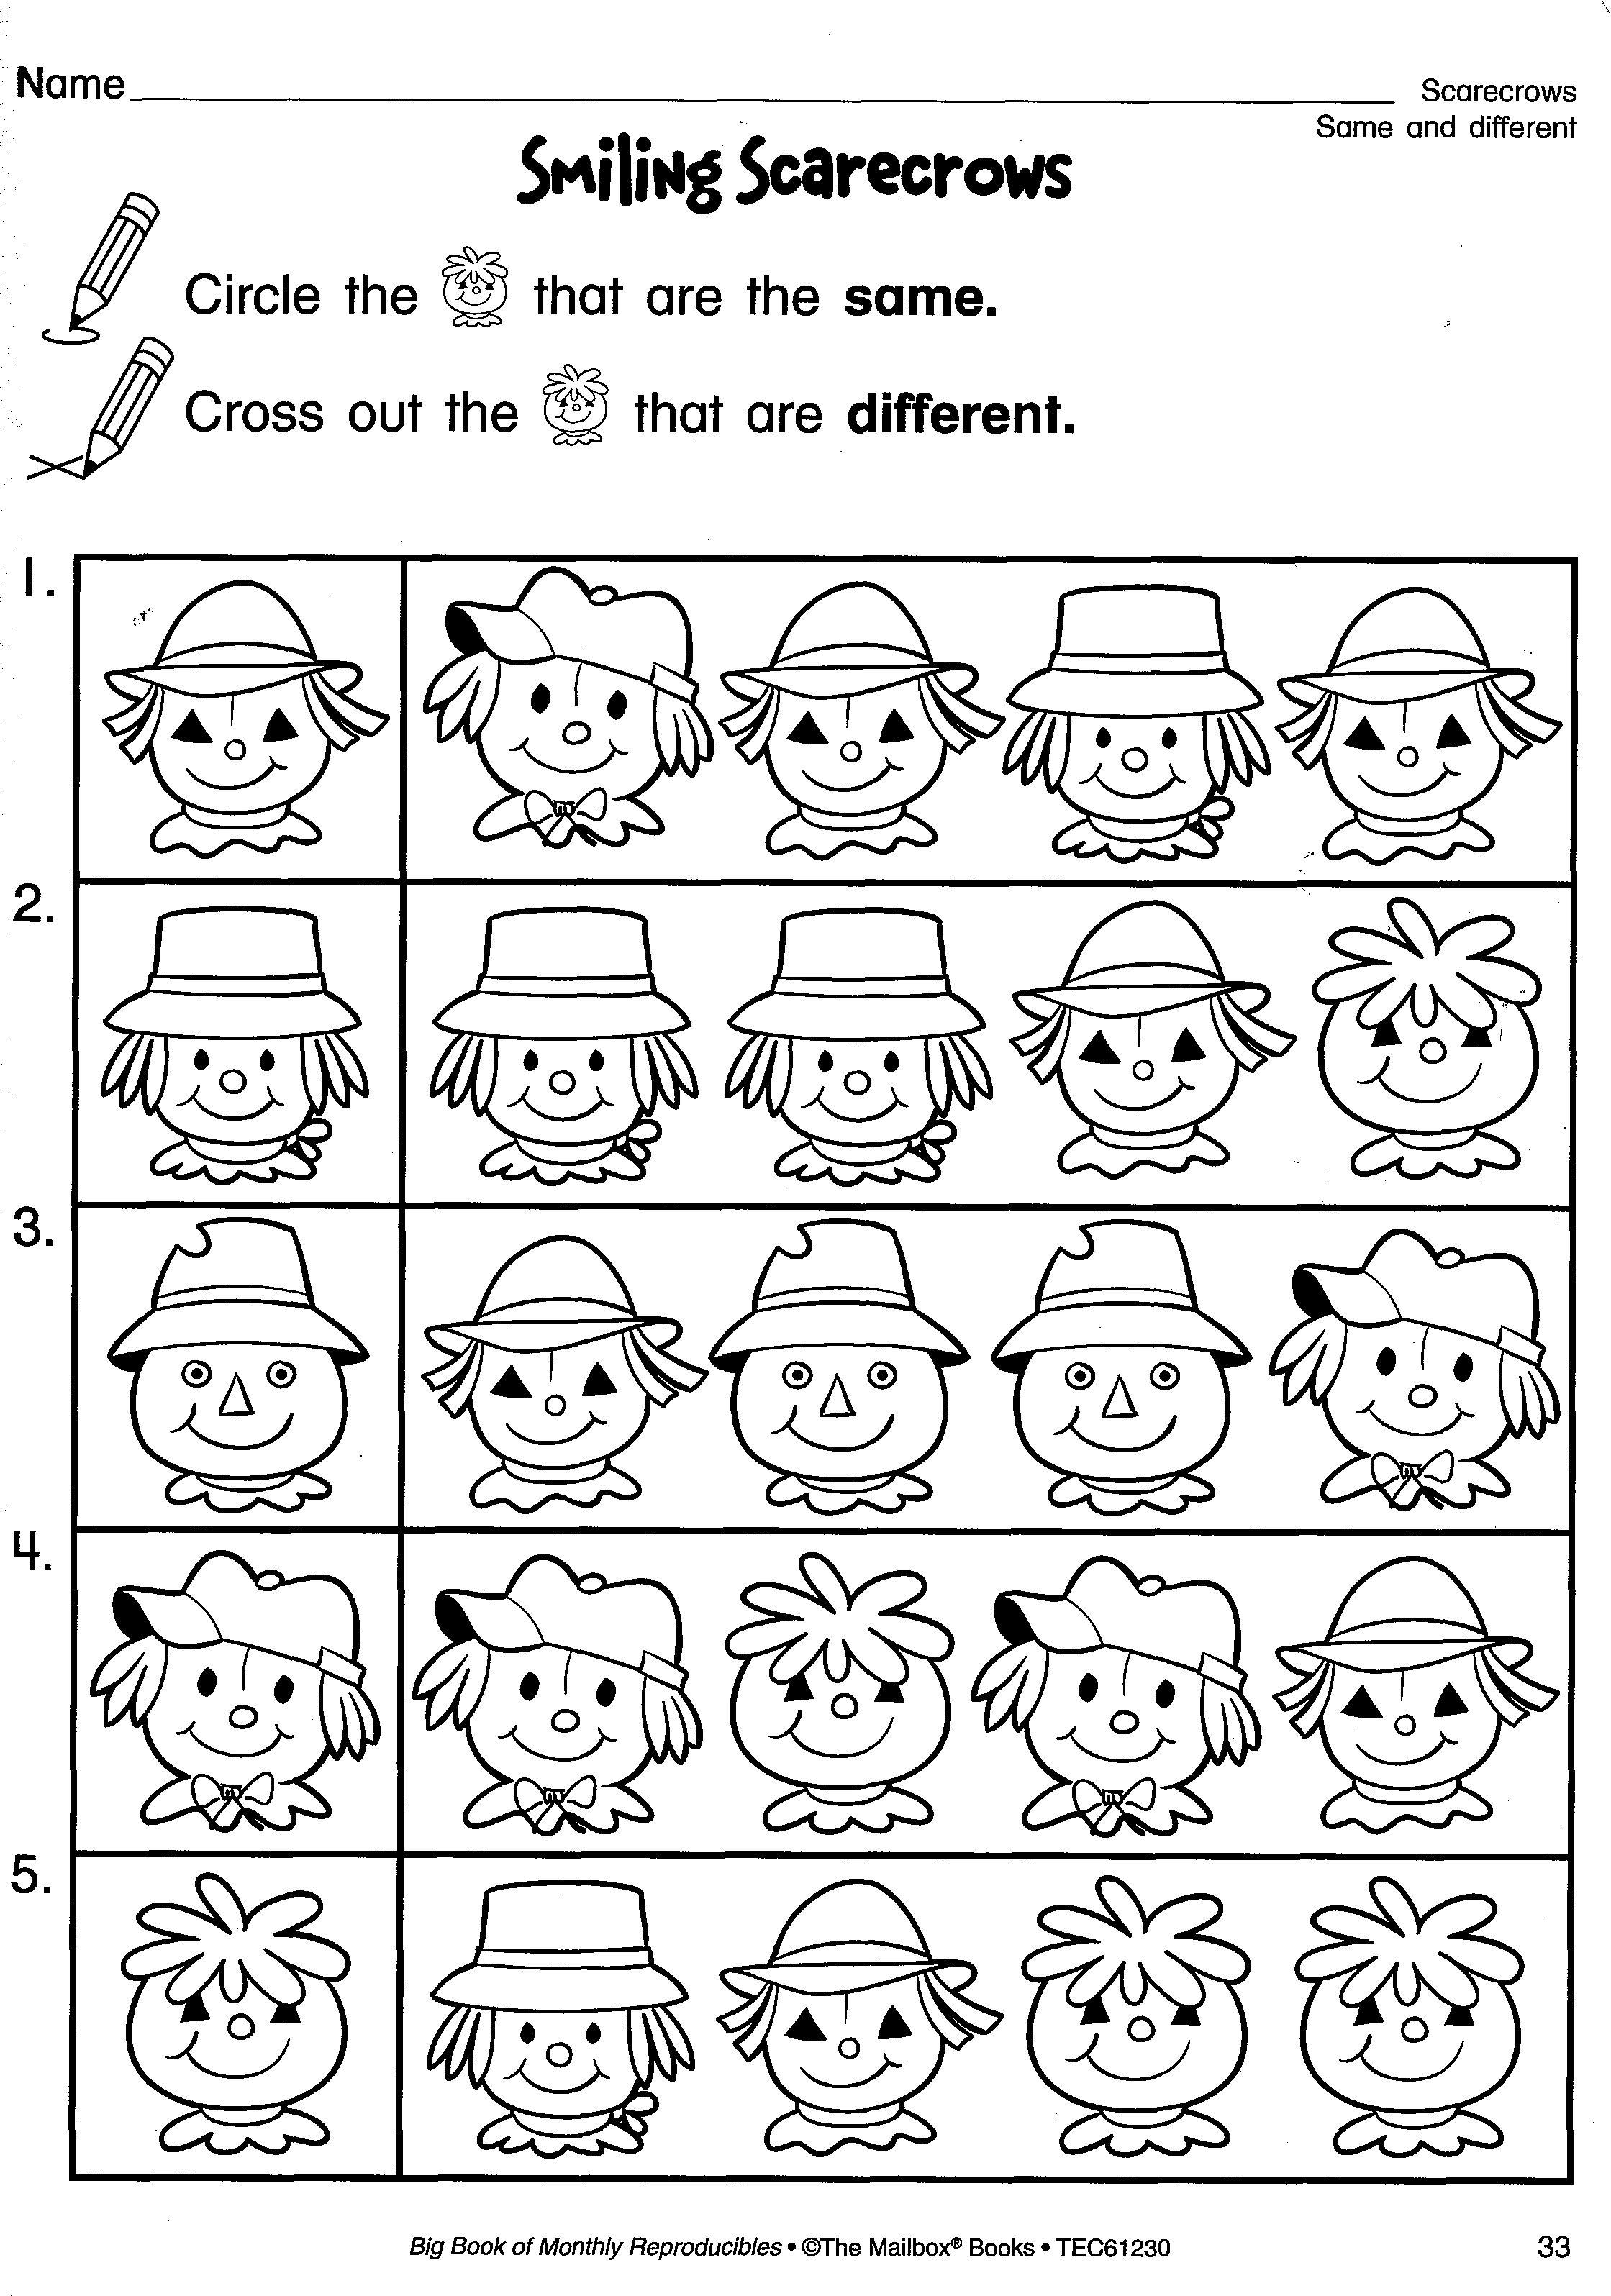 Reproducible Student Worksheet